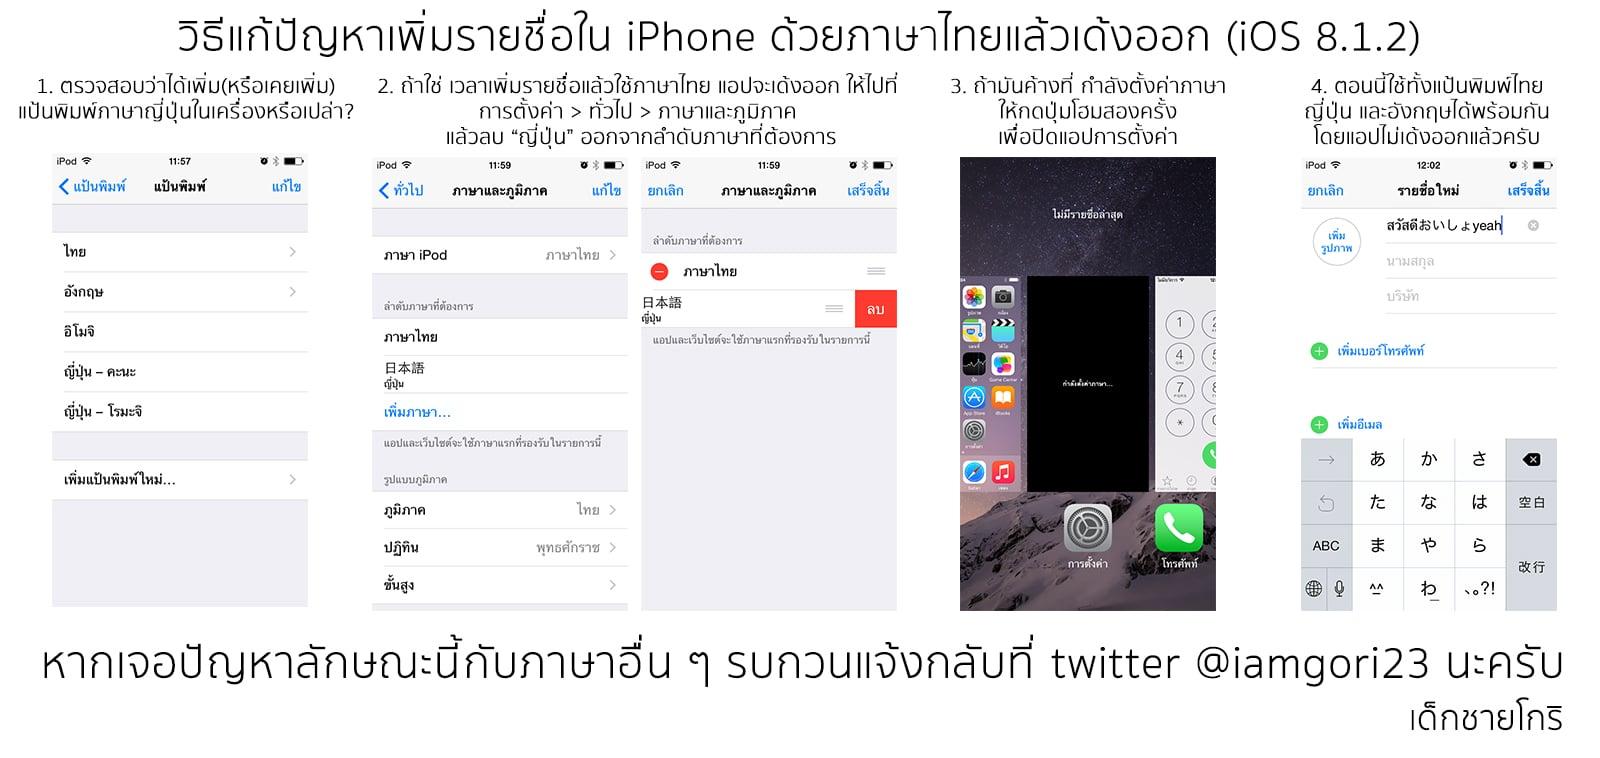 ios-8-1-2-fix-thai-language-crash-add-contact